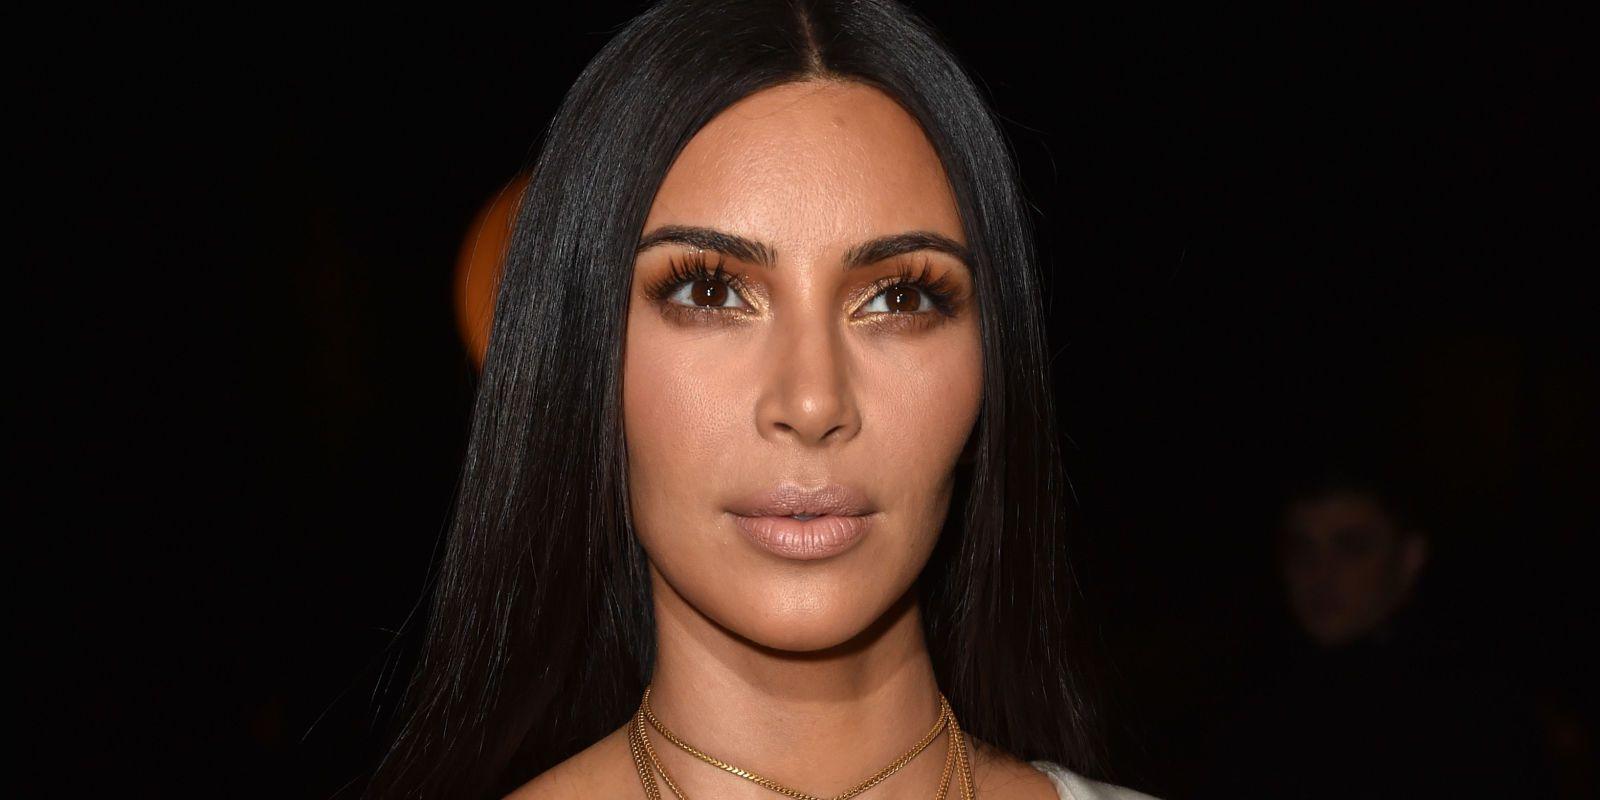 Kim Kardashian's Robbers Weren't Looking for Jewelry When They Broke In